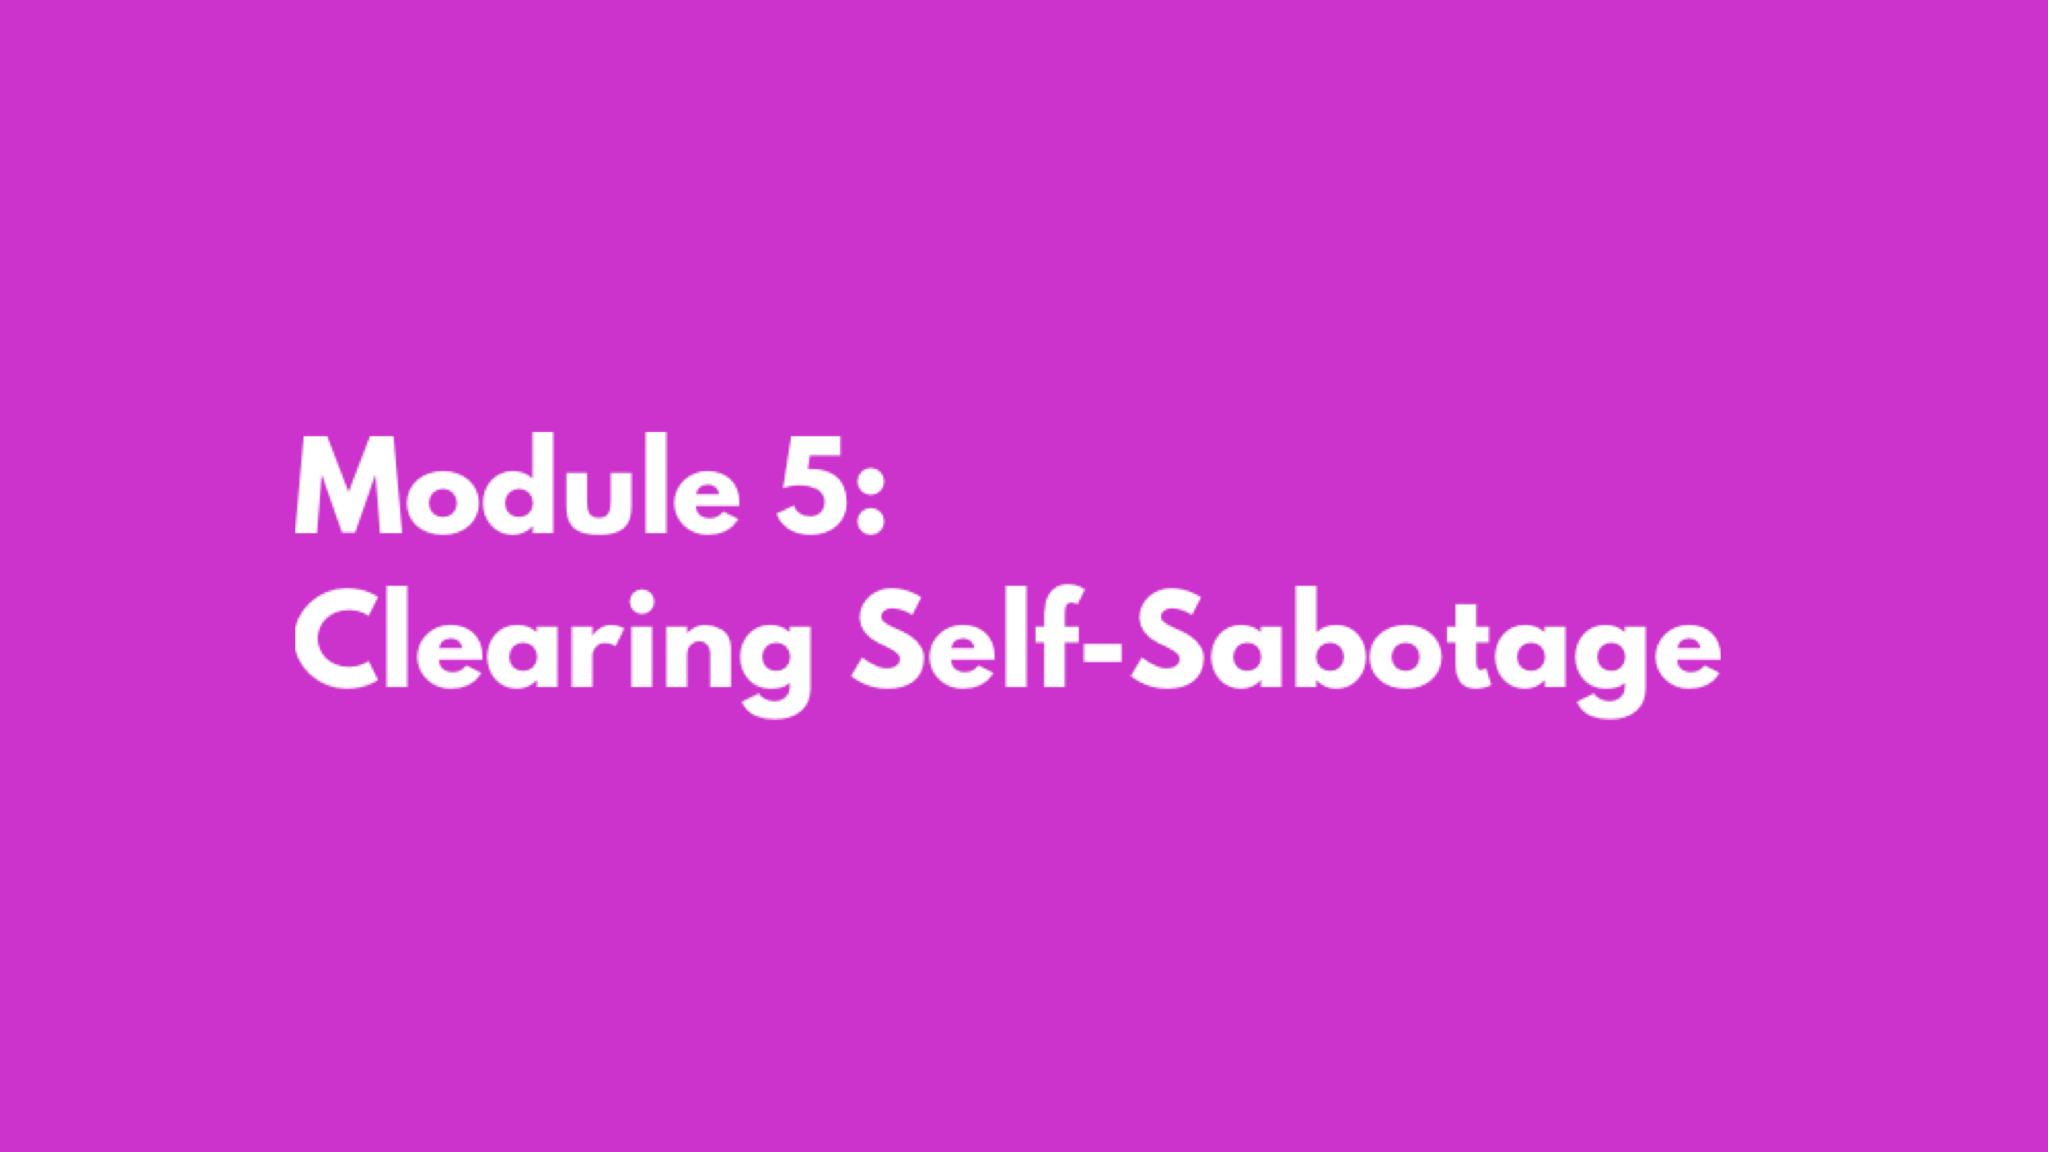 Model 5: Clearing Self-Sabotage